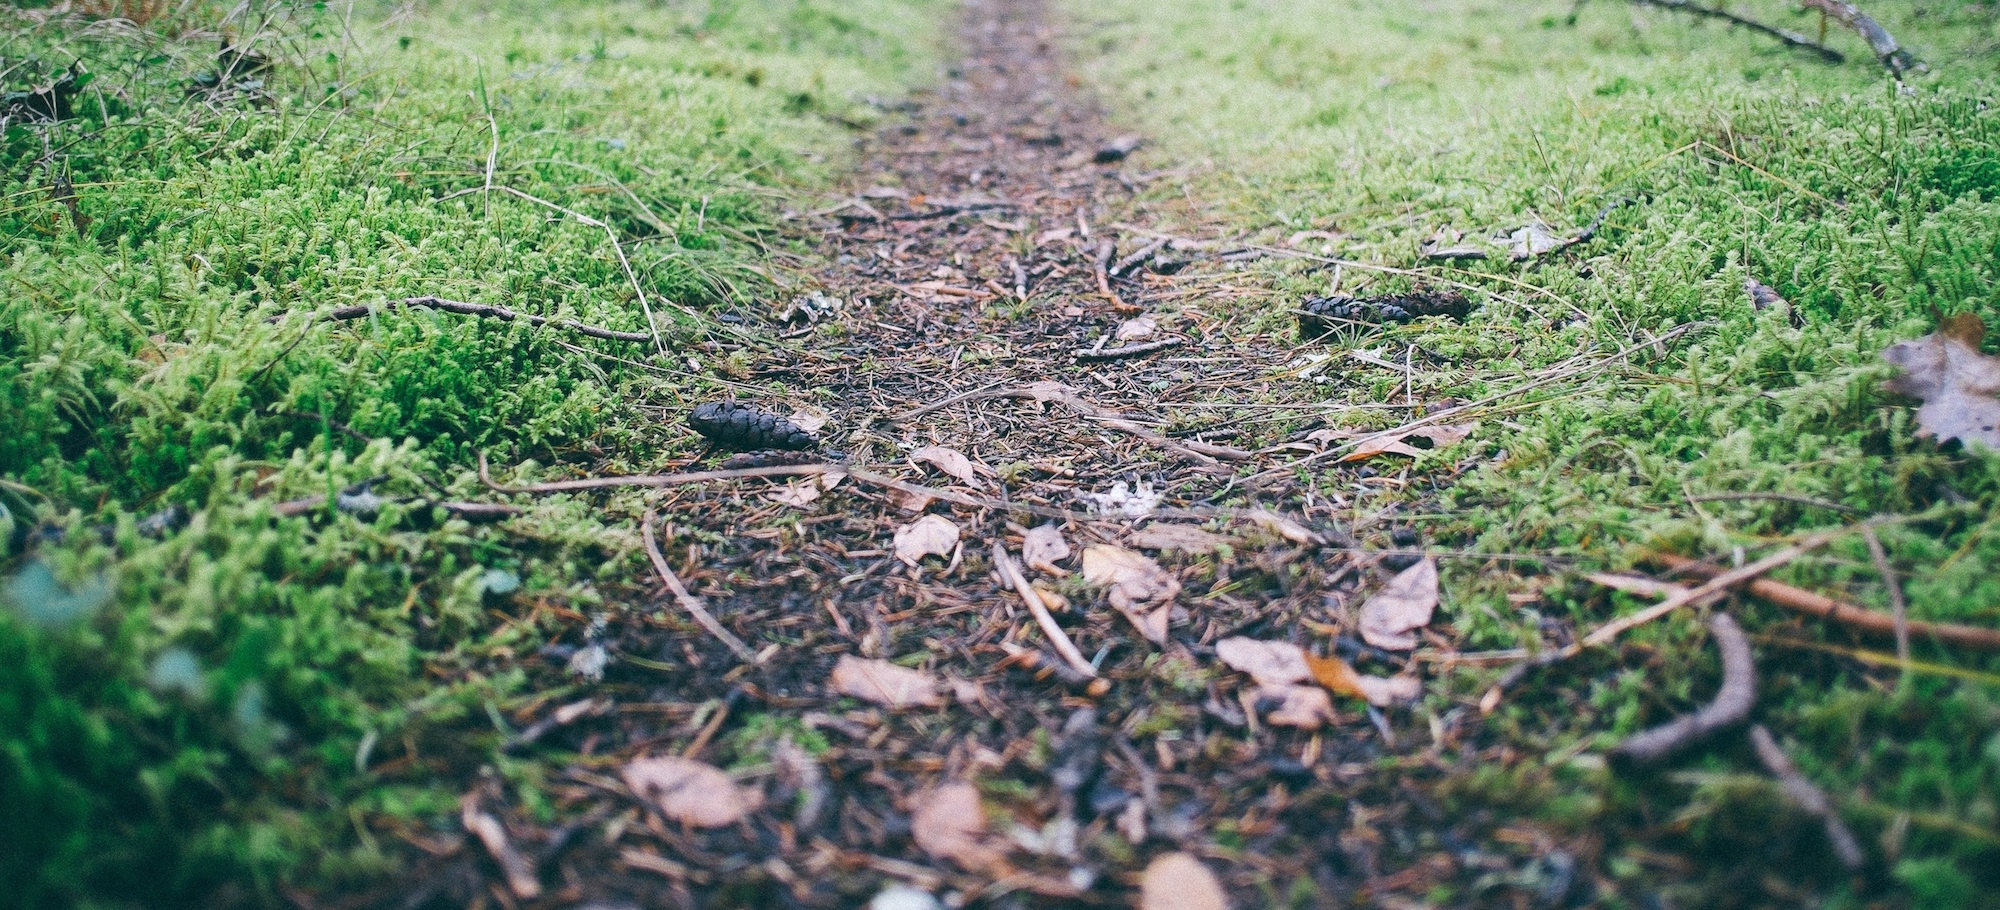 Walking in the Truth (2 John 7-13)